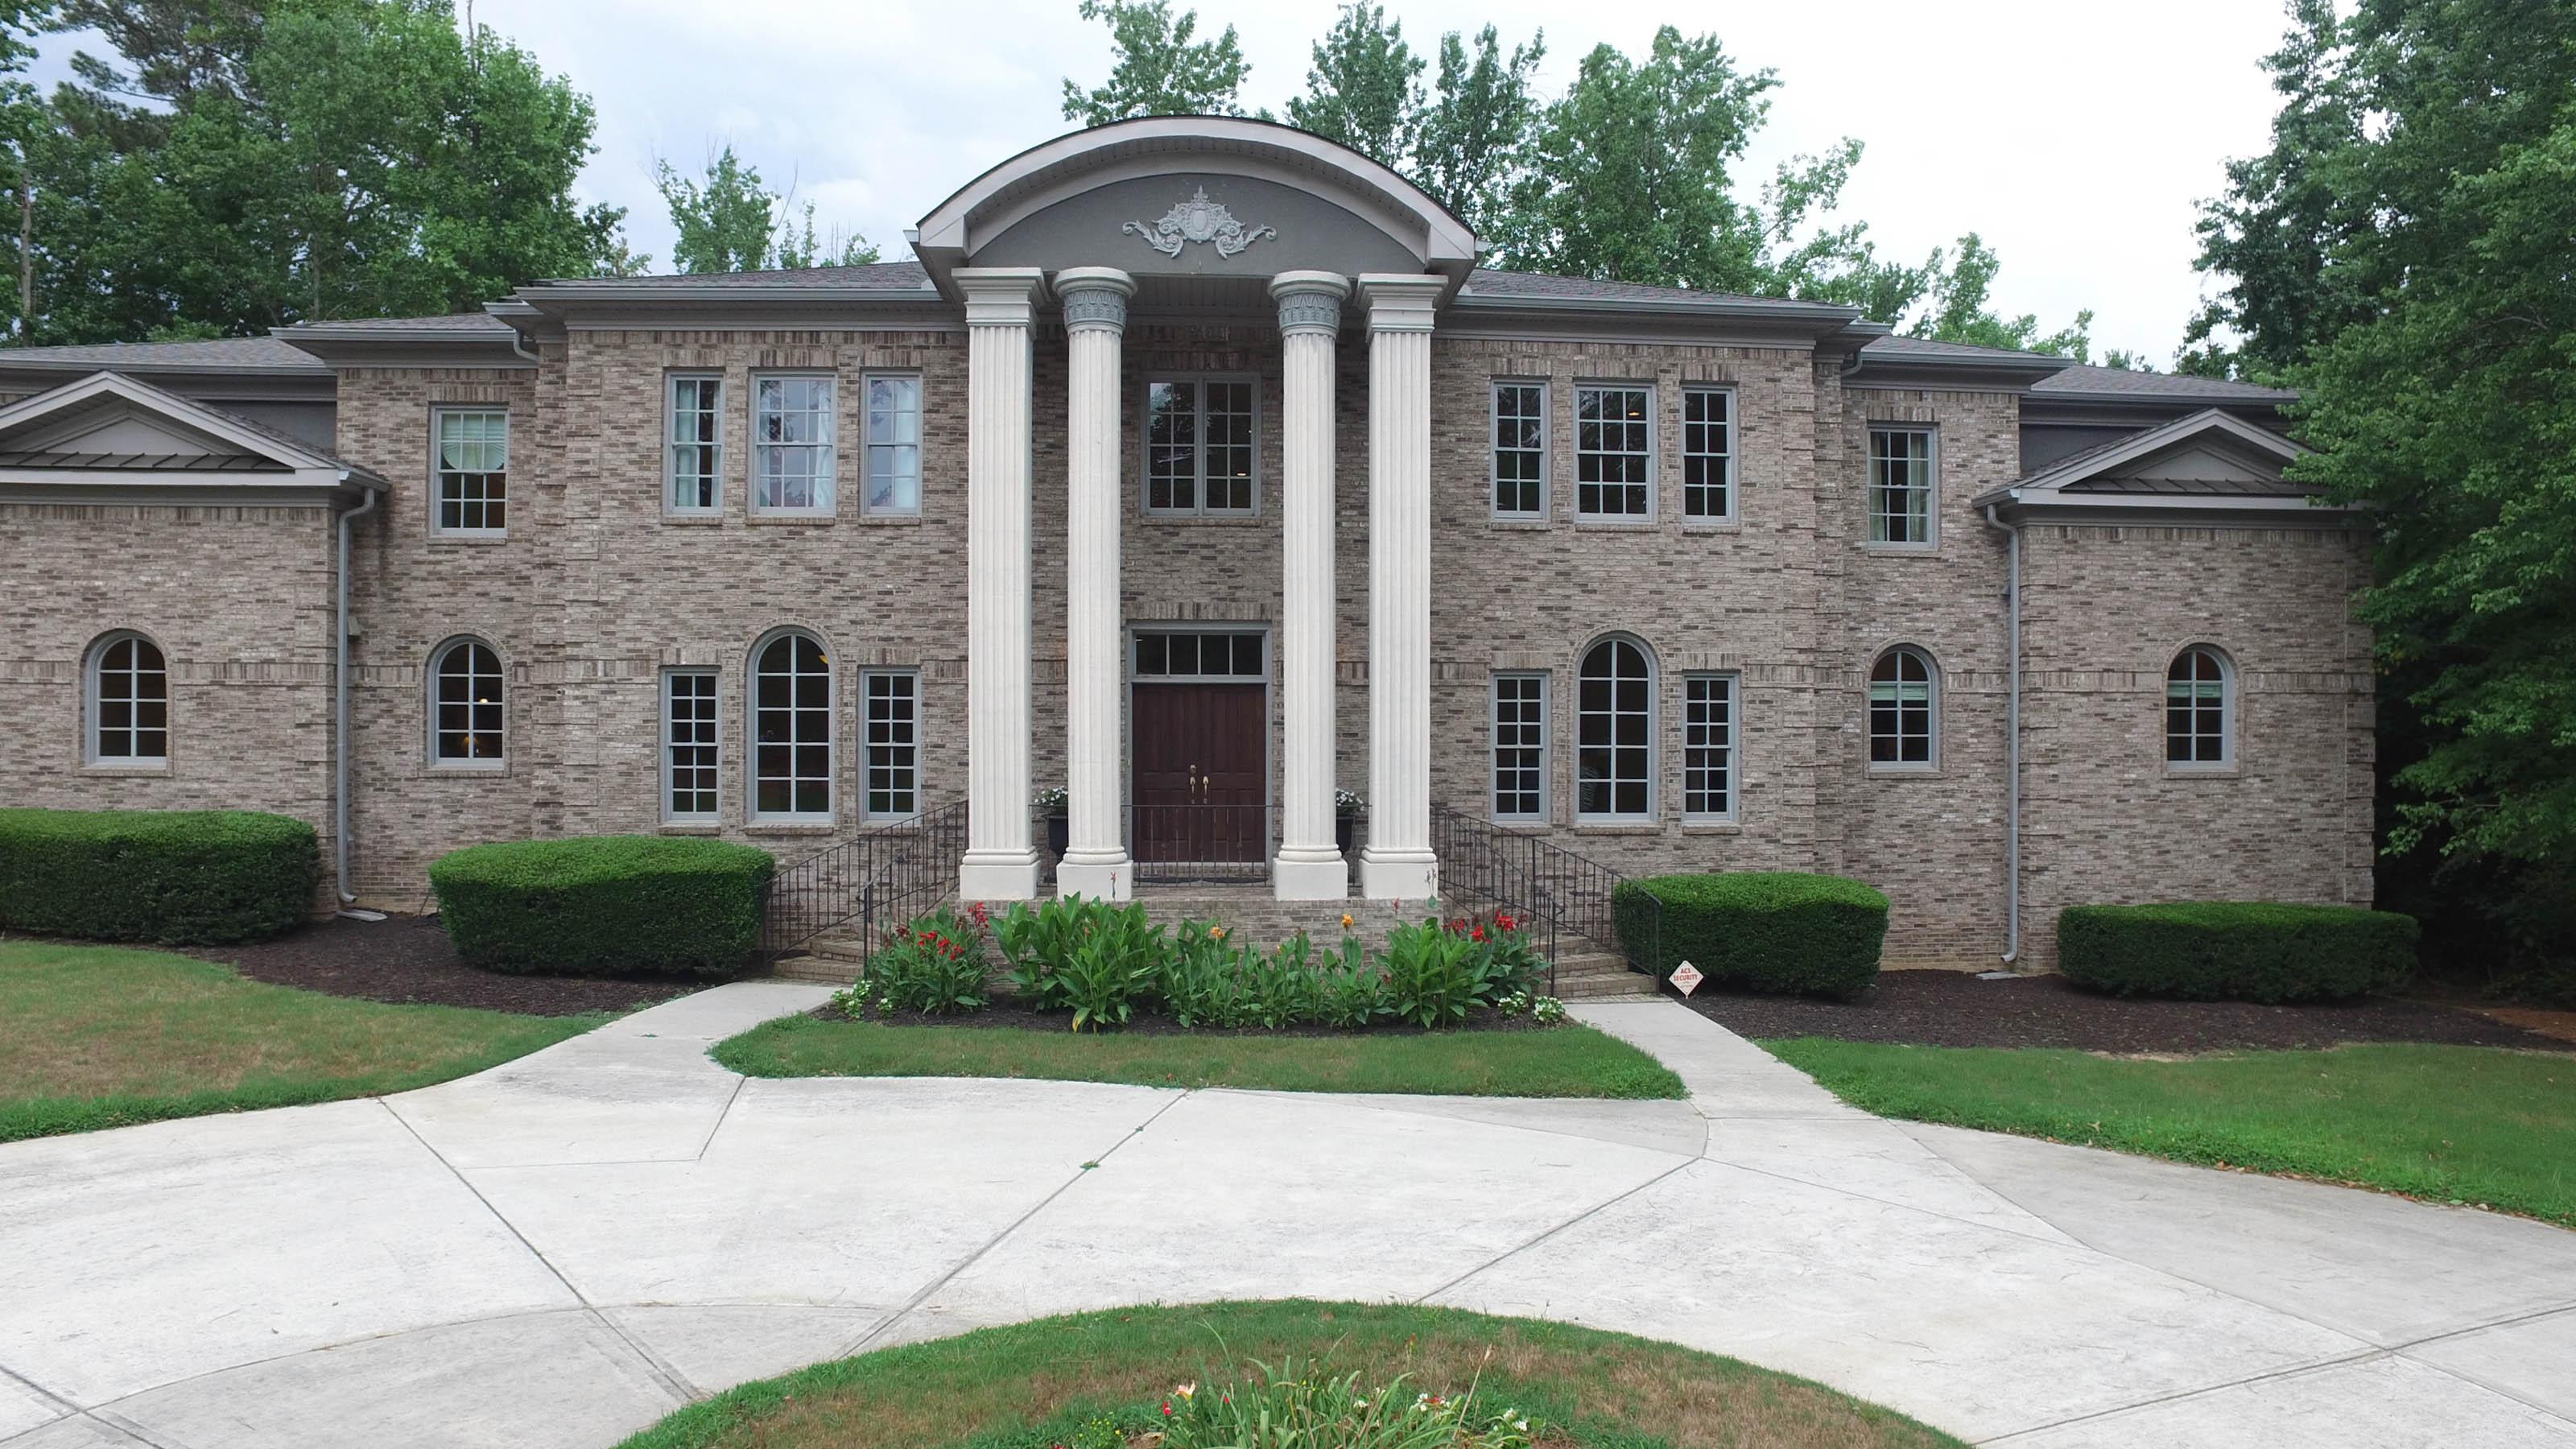 Moradia para Venda às Stunning, Custom-Built Home on 6.5+- Acres 1990 Enon Road SW Atlanta, Geórgia, 30331 Estados Unidos